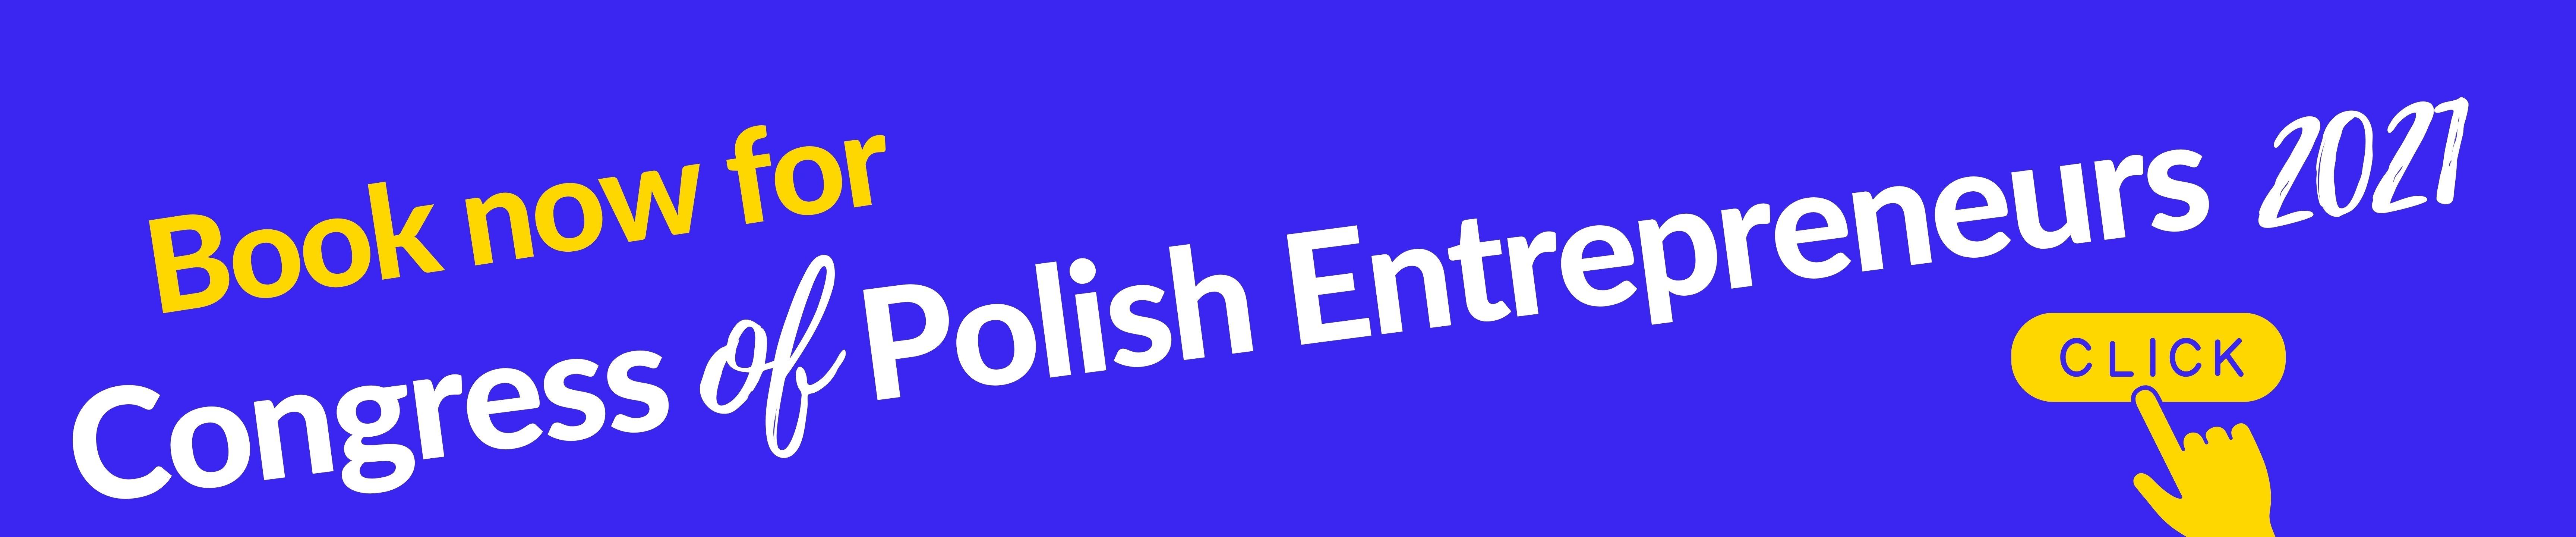 PBLINK congress of Polish Entrepreneurs in the UK 2021